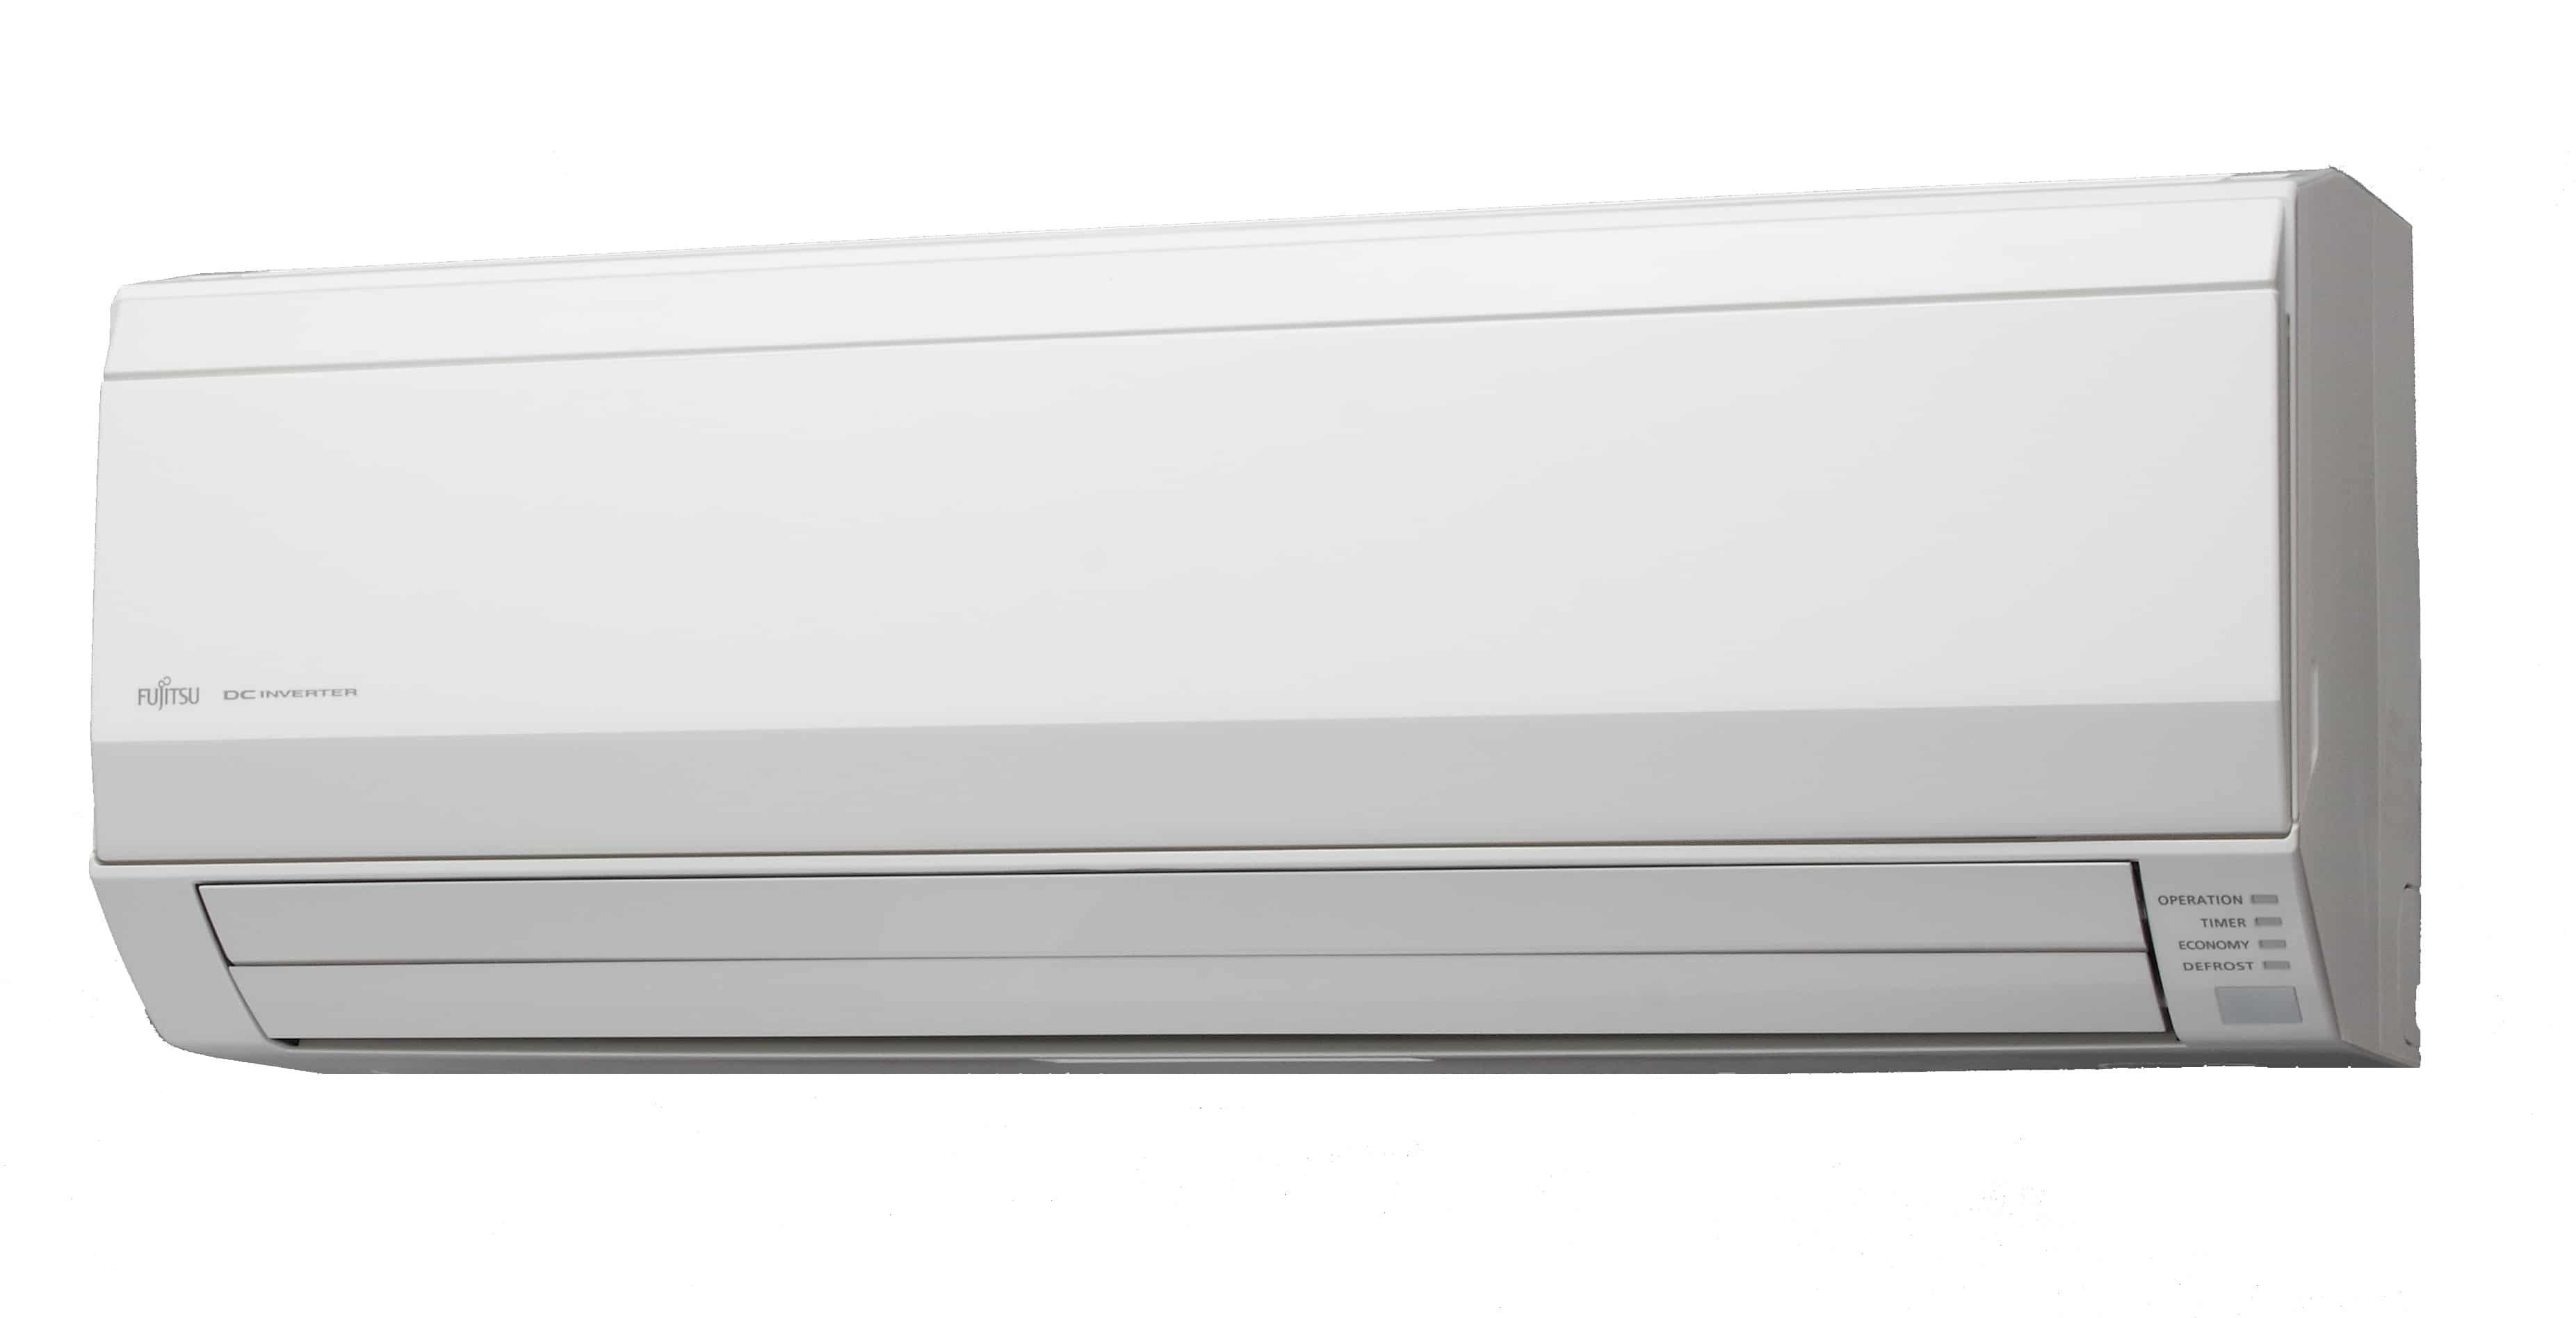 Fujitsu Classic Reverse Cycle Split System Air Conditioner